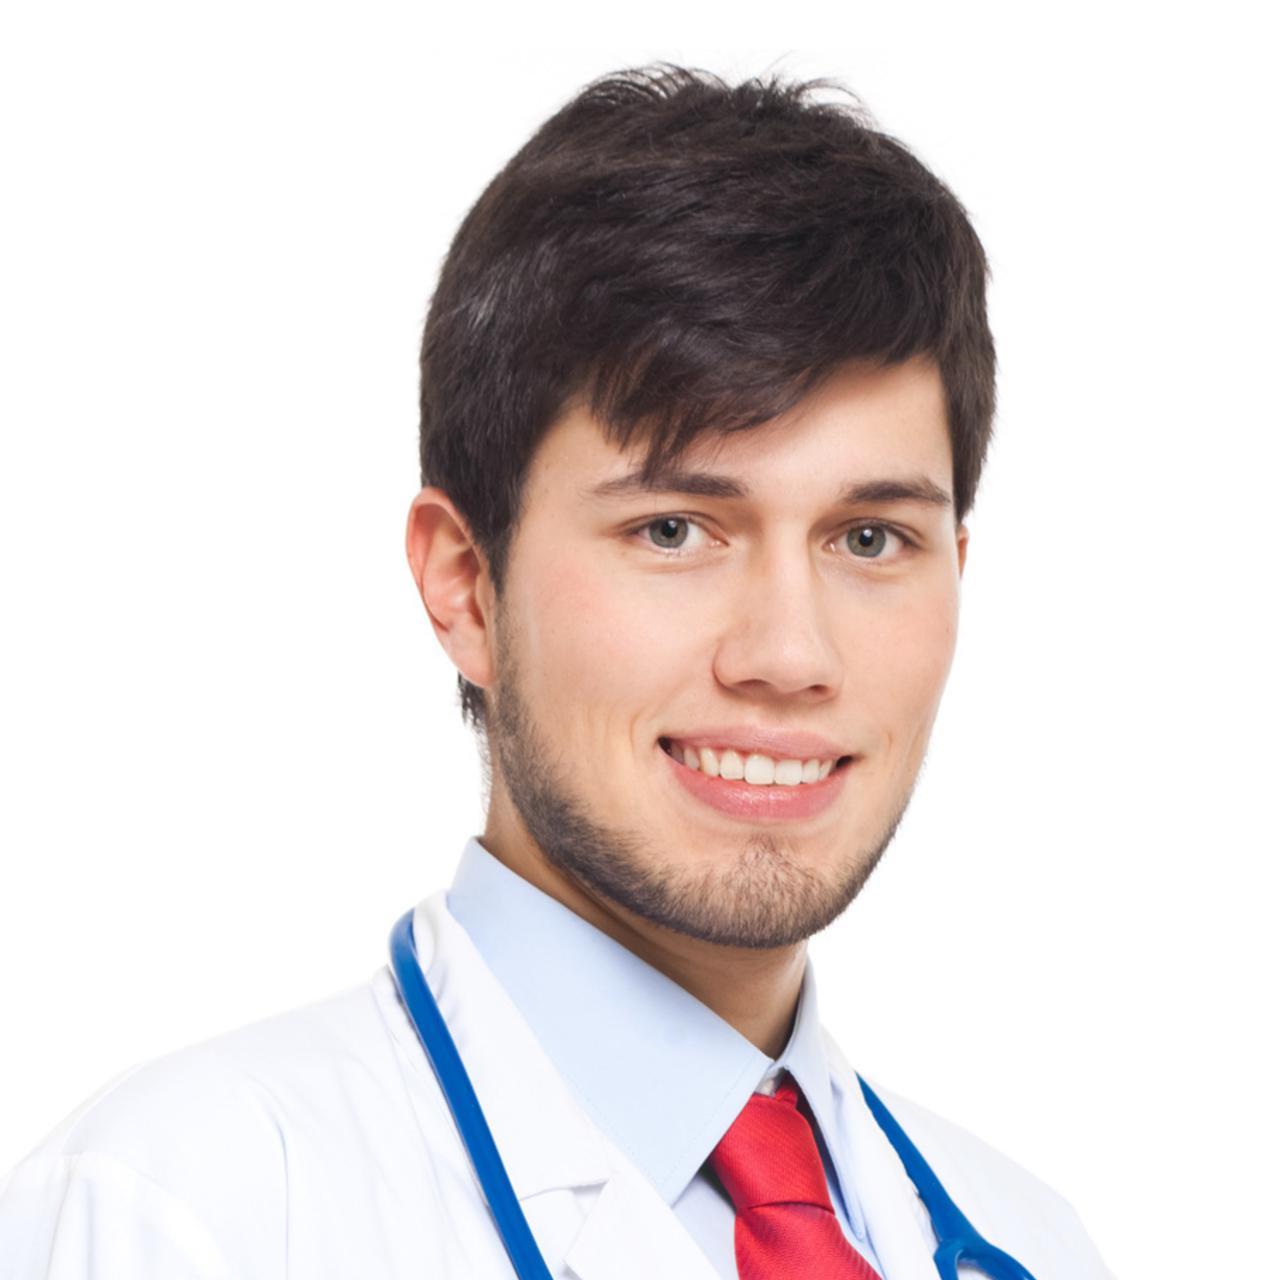 74061942-9989-11e7-ae47-0242ac110002-Medical_21.jpg